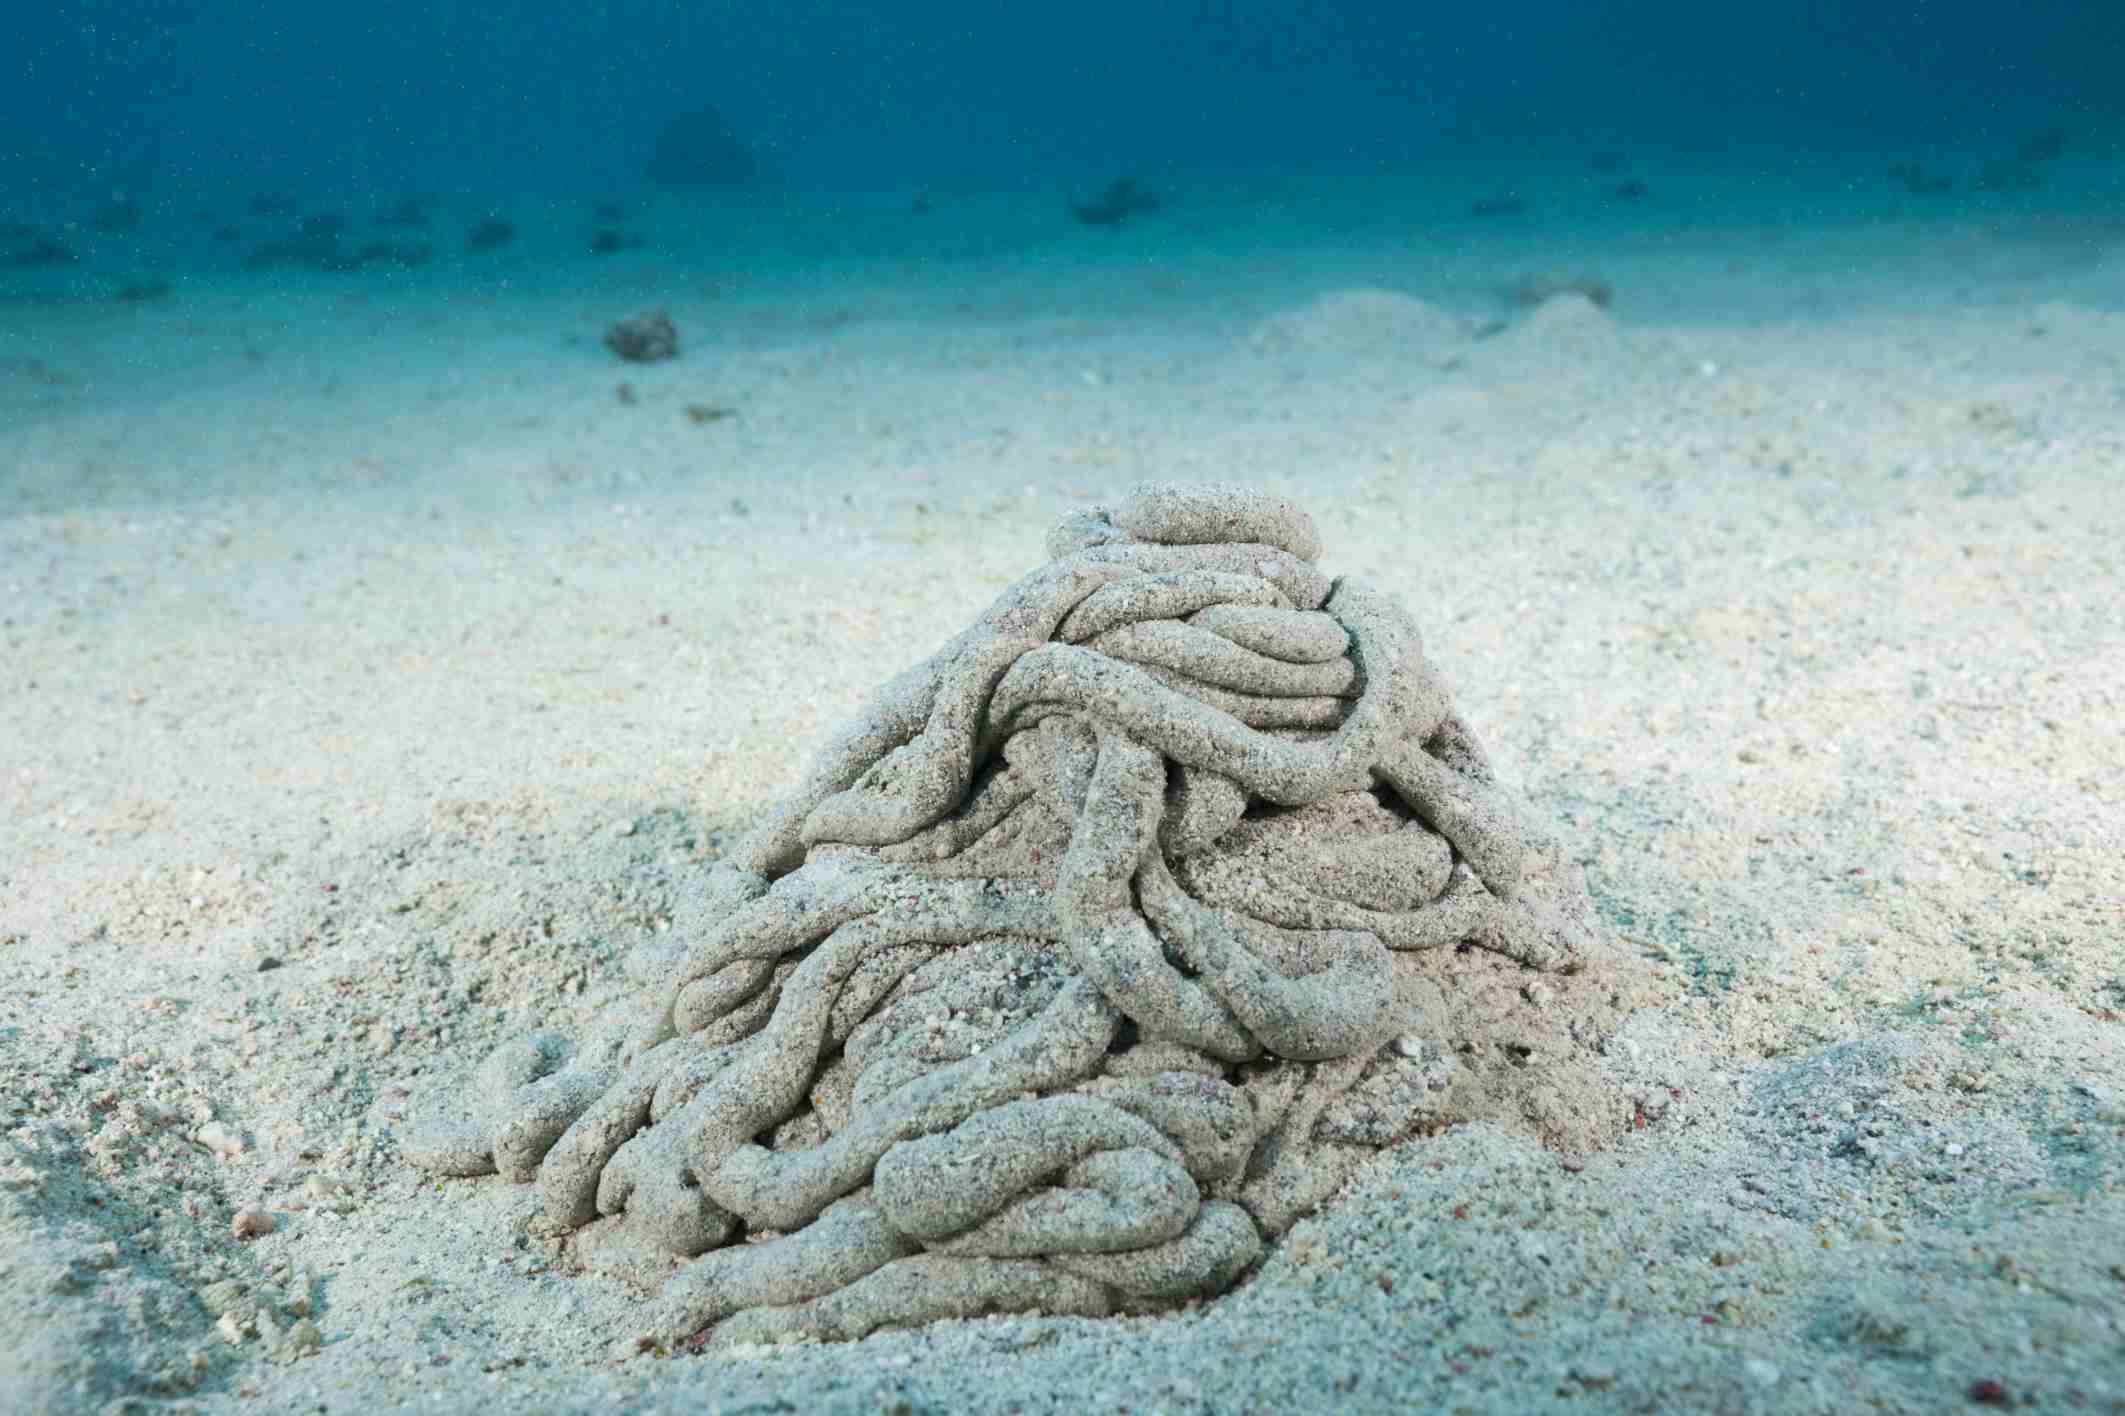 Excretions of Sea Cucumber, Marsa Alam, Red Sea, Egypt